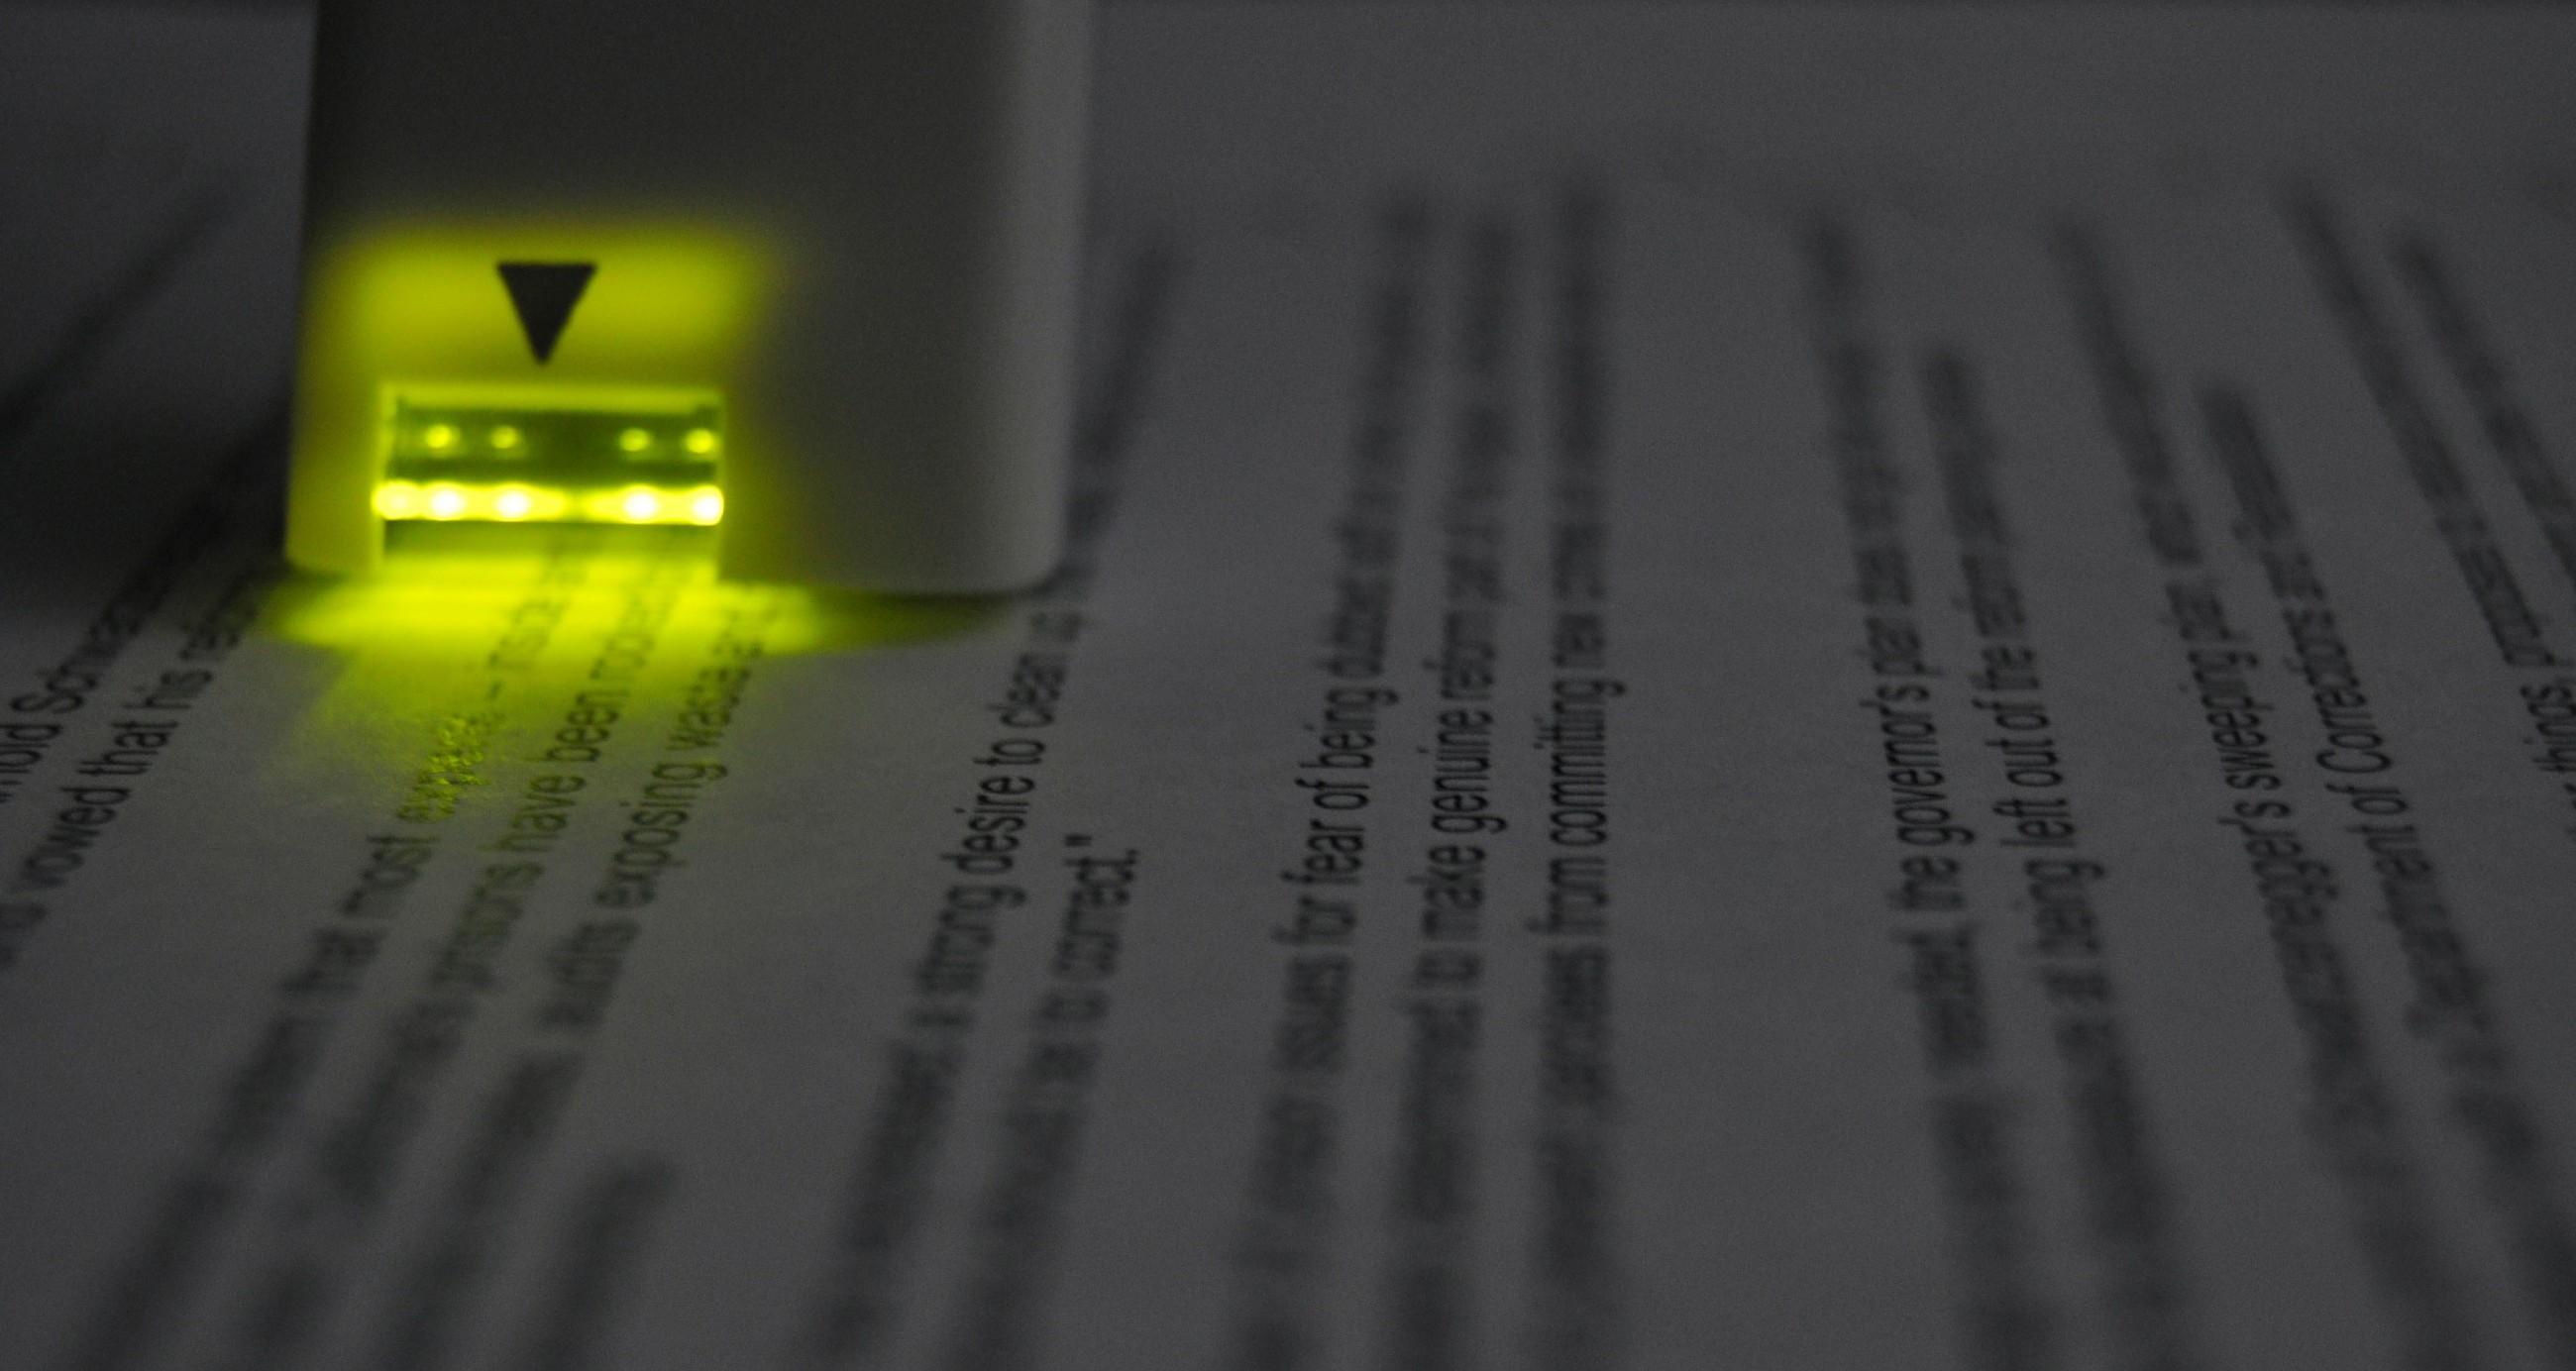 Call for Digital Editorial Fellows